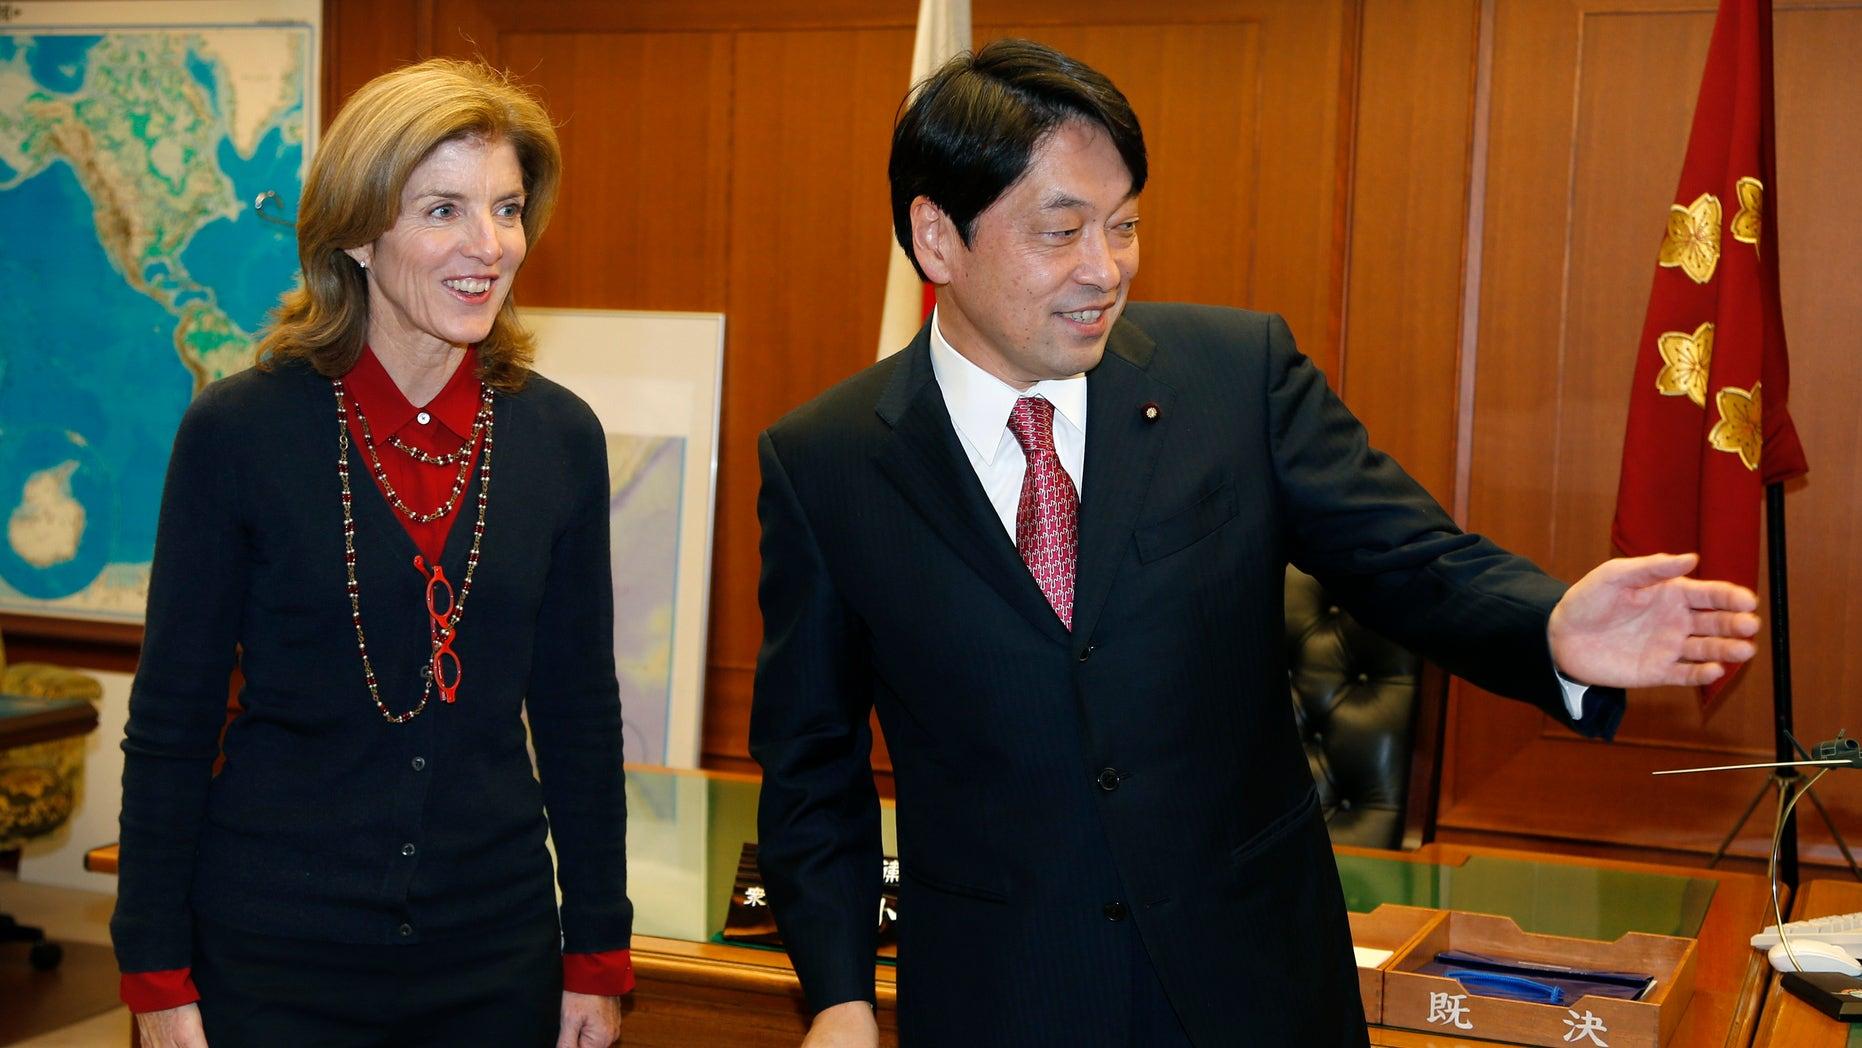 New U.S. Ambassador to Japan Caroline Kennedy is greeted by Japanese Defense Minister Itsunori Onodera at the start of their meeting at Japan's Defense Ministry in Tokyo, Thursday, Nov. 21, 2013. (AP Photo/Shizuo Kambayashi)